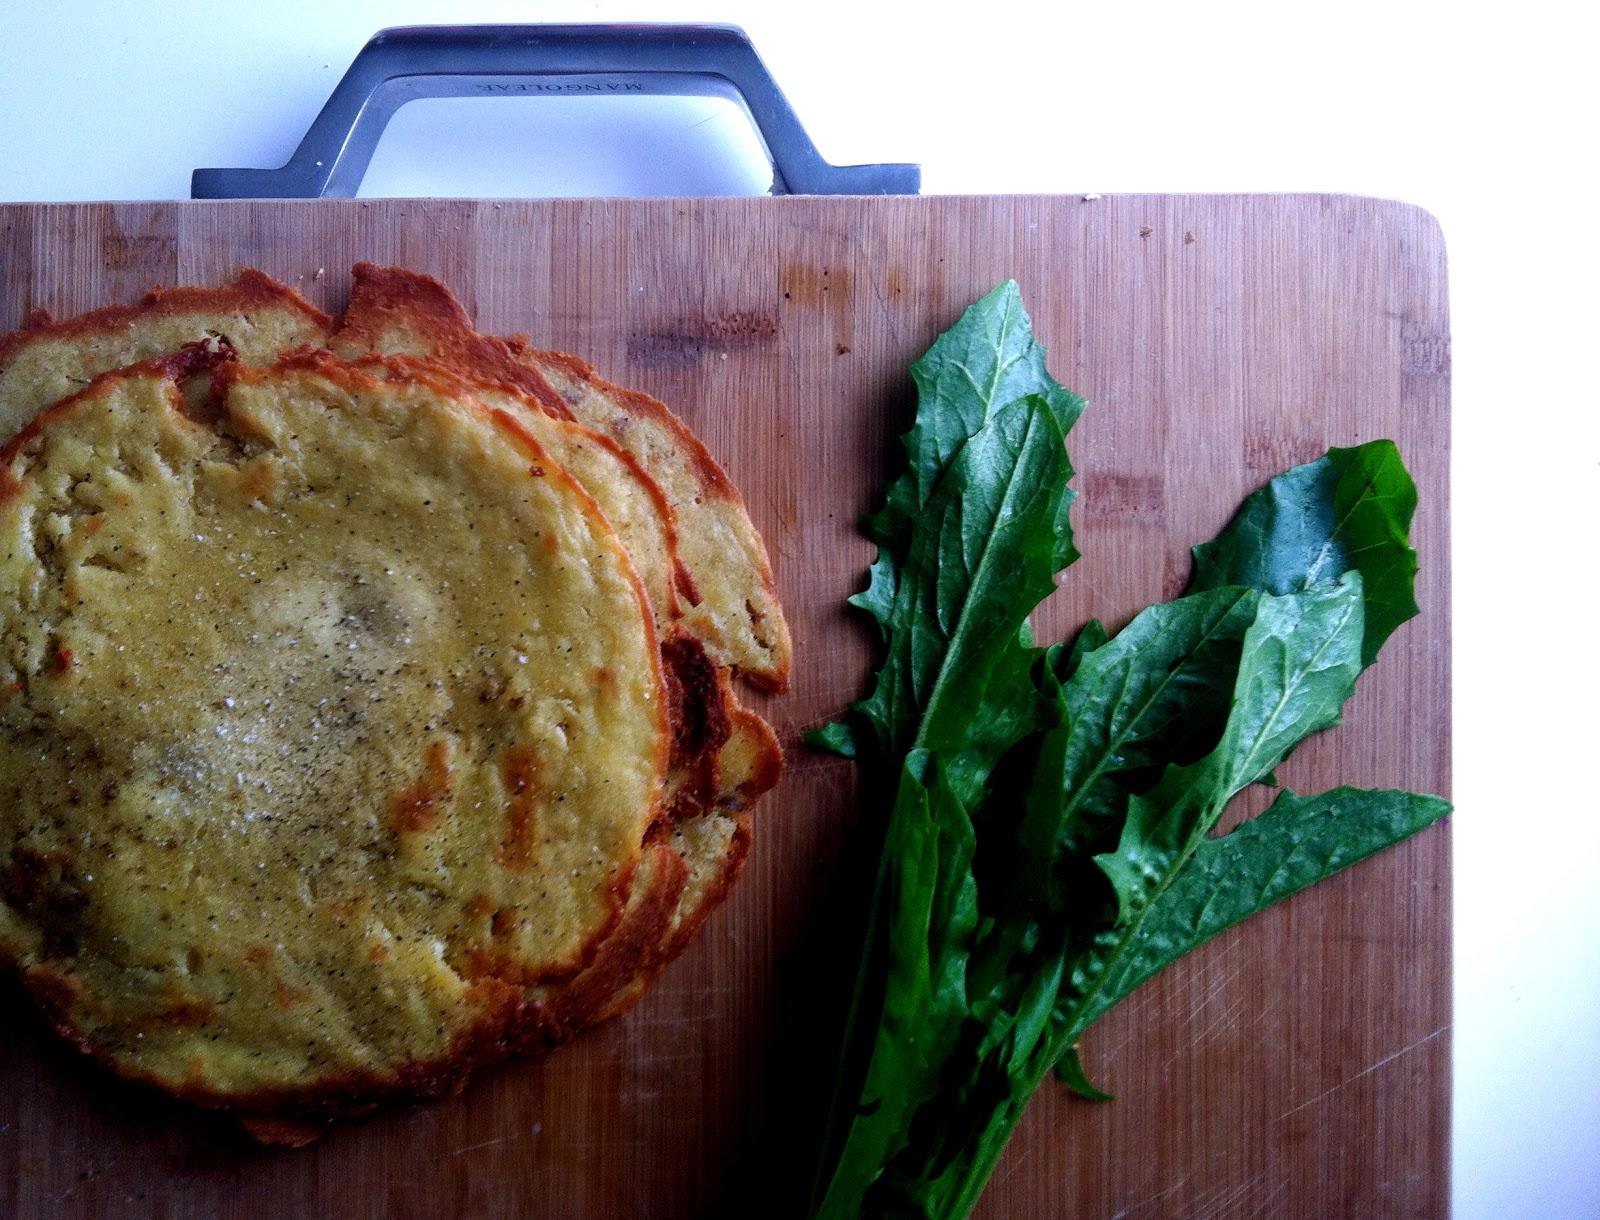 Slow Club Cookery Gluten Free Chickpea Flatbread